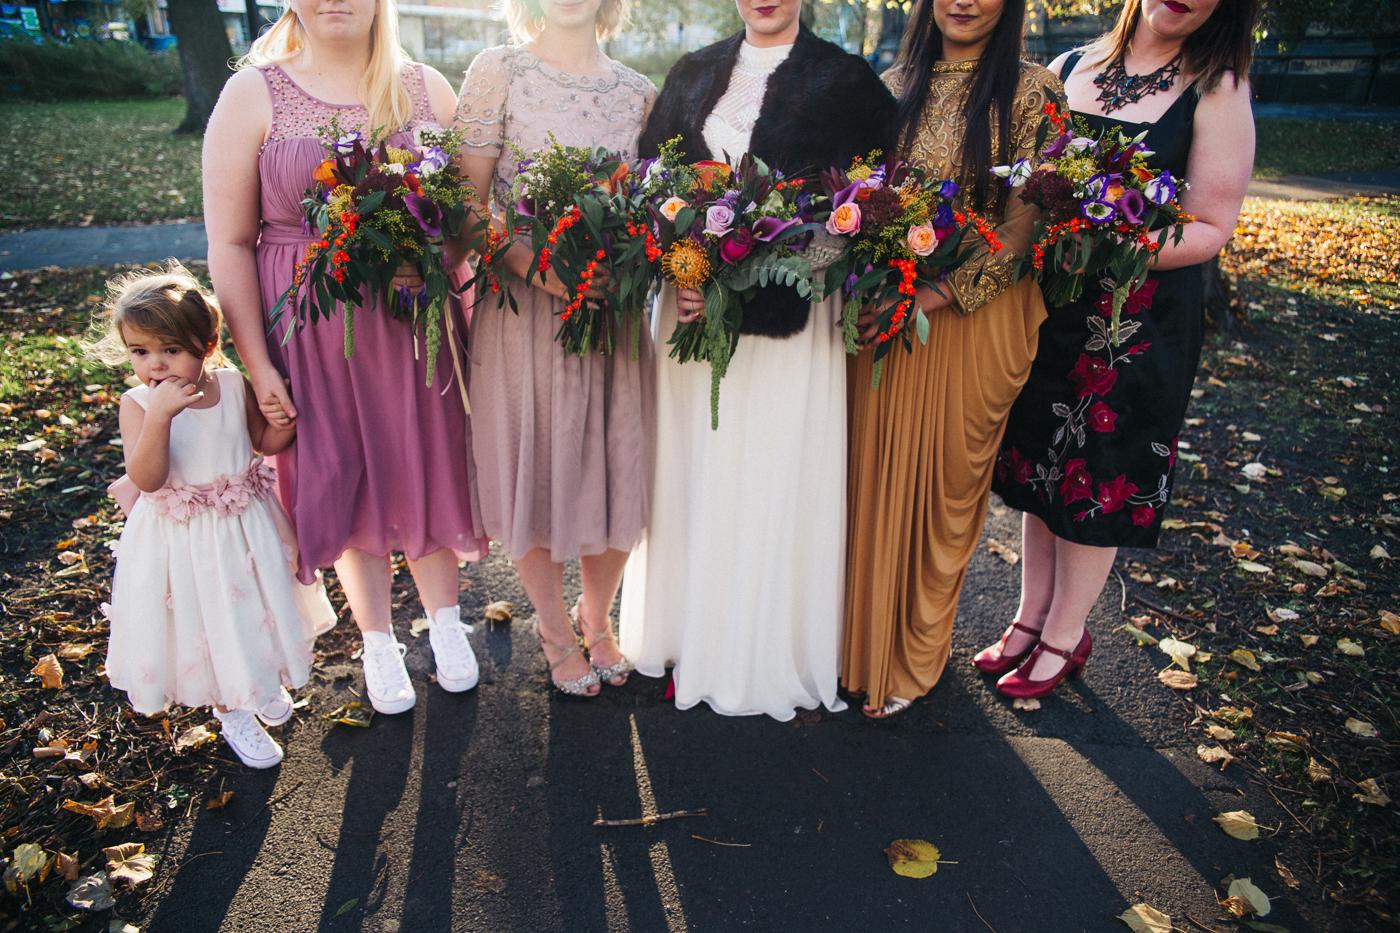 teesside-newcastle-gateshead-wedding-photography-photographer-creative-0043.jpg